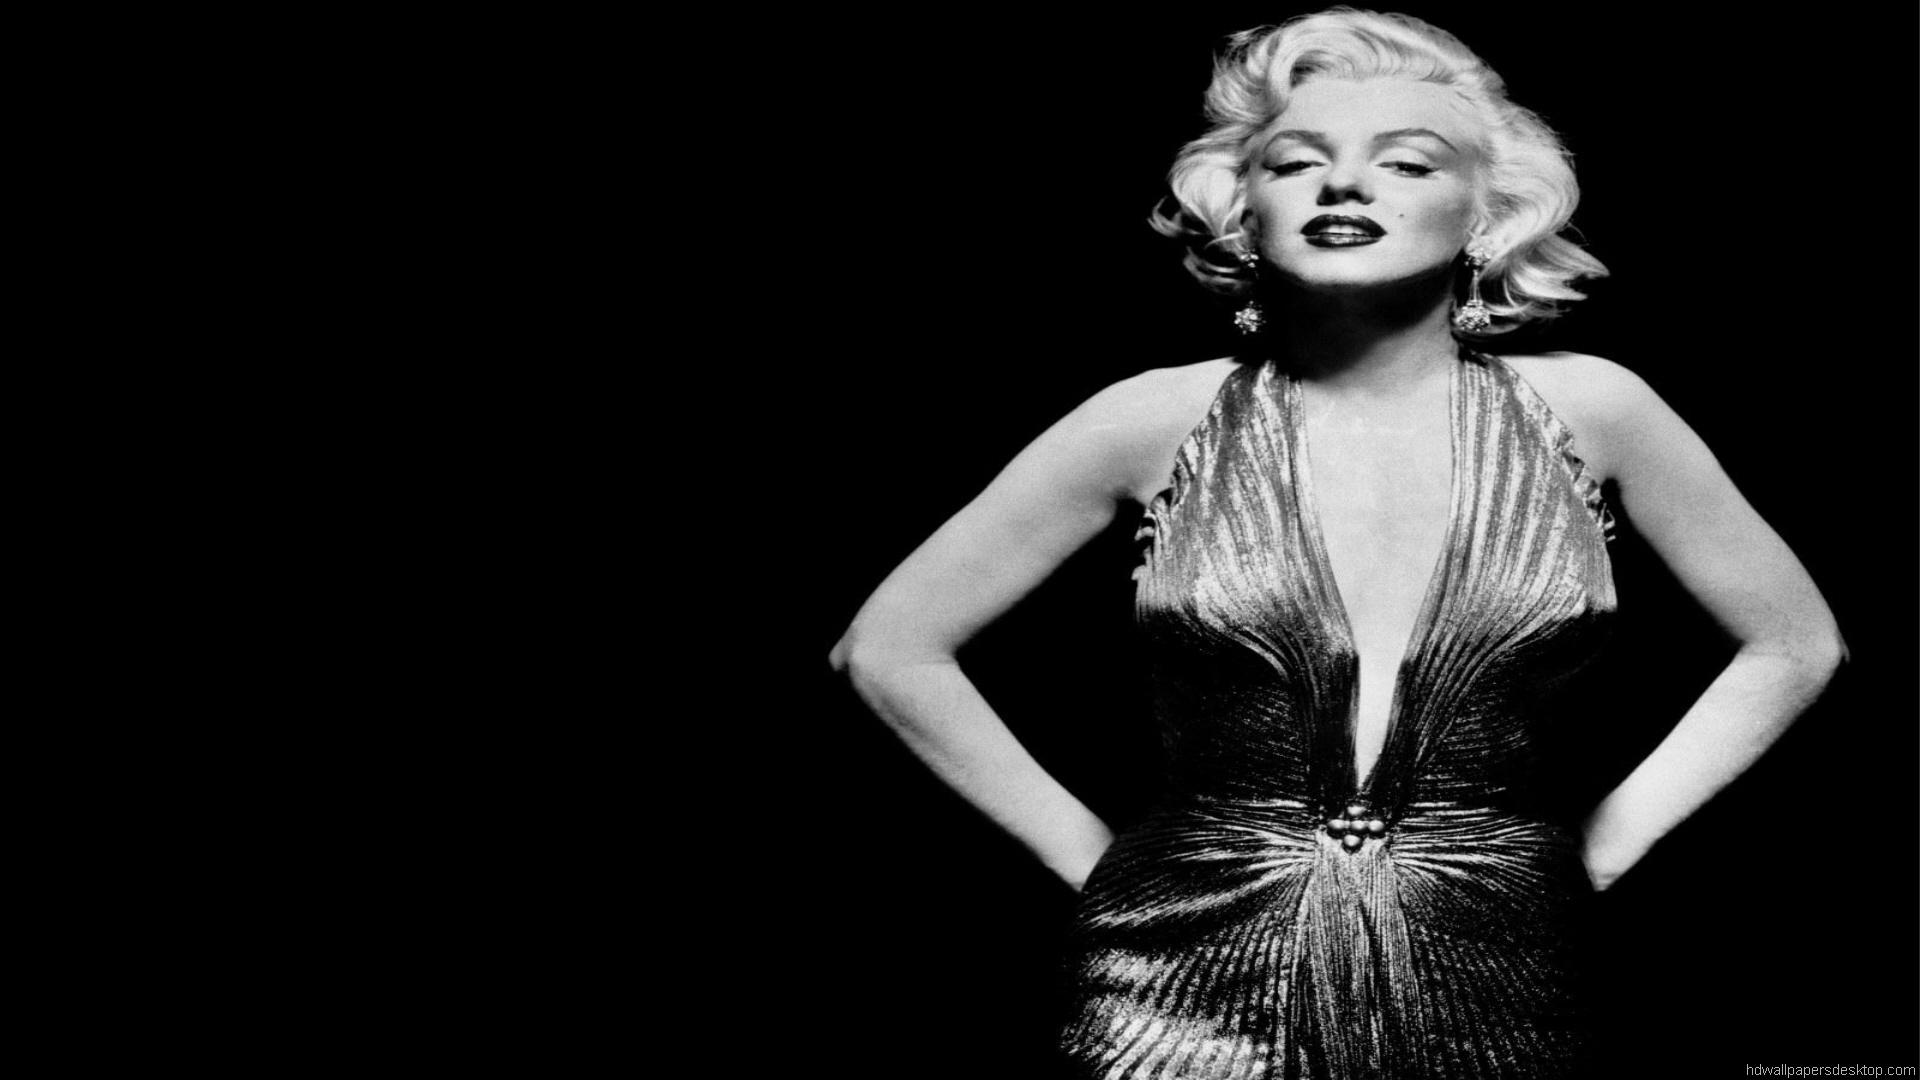 Image Result For Hd Marilyn Monroe Wallpaper Hd Marilyn Monroe Wallpapers Wallpapersafari